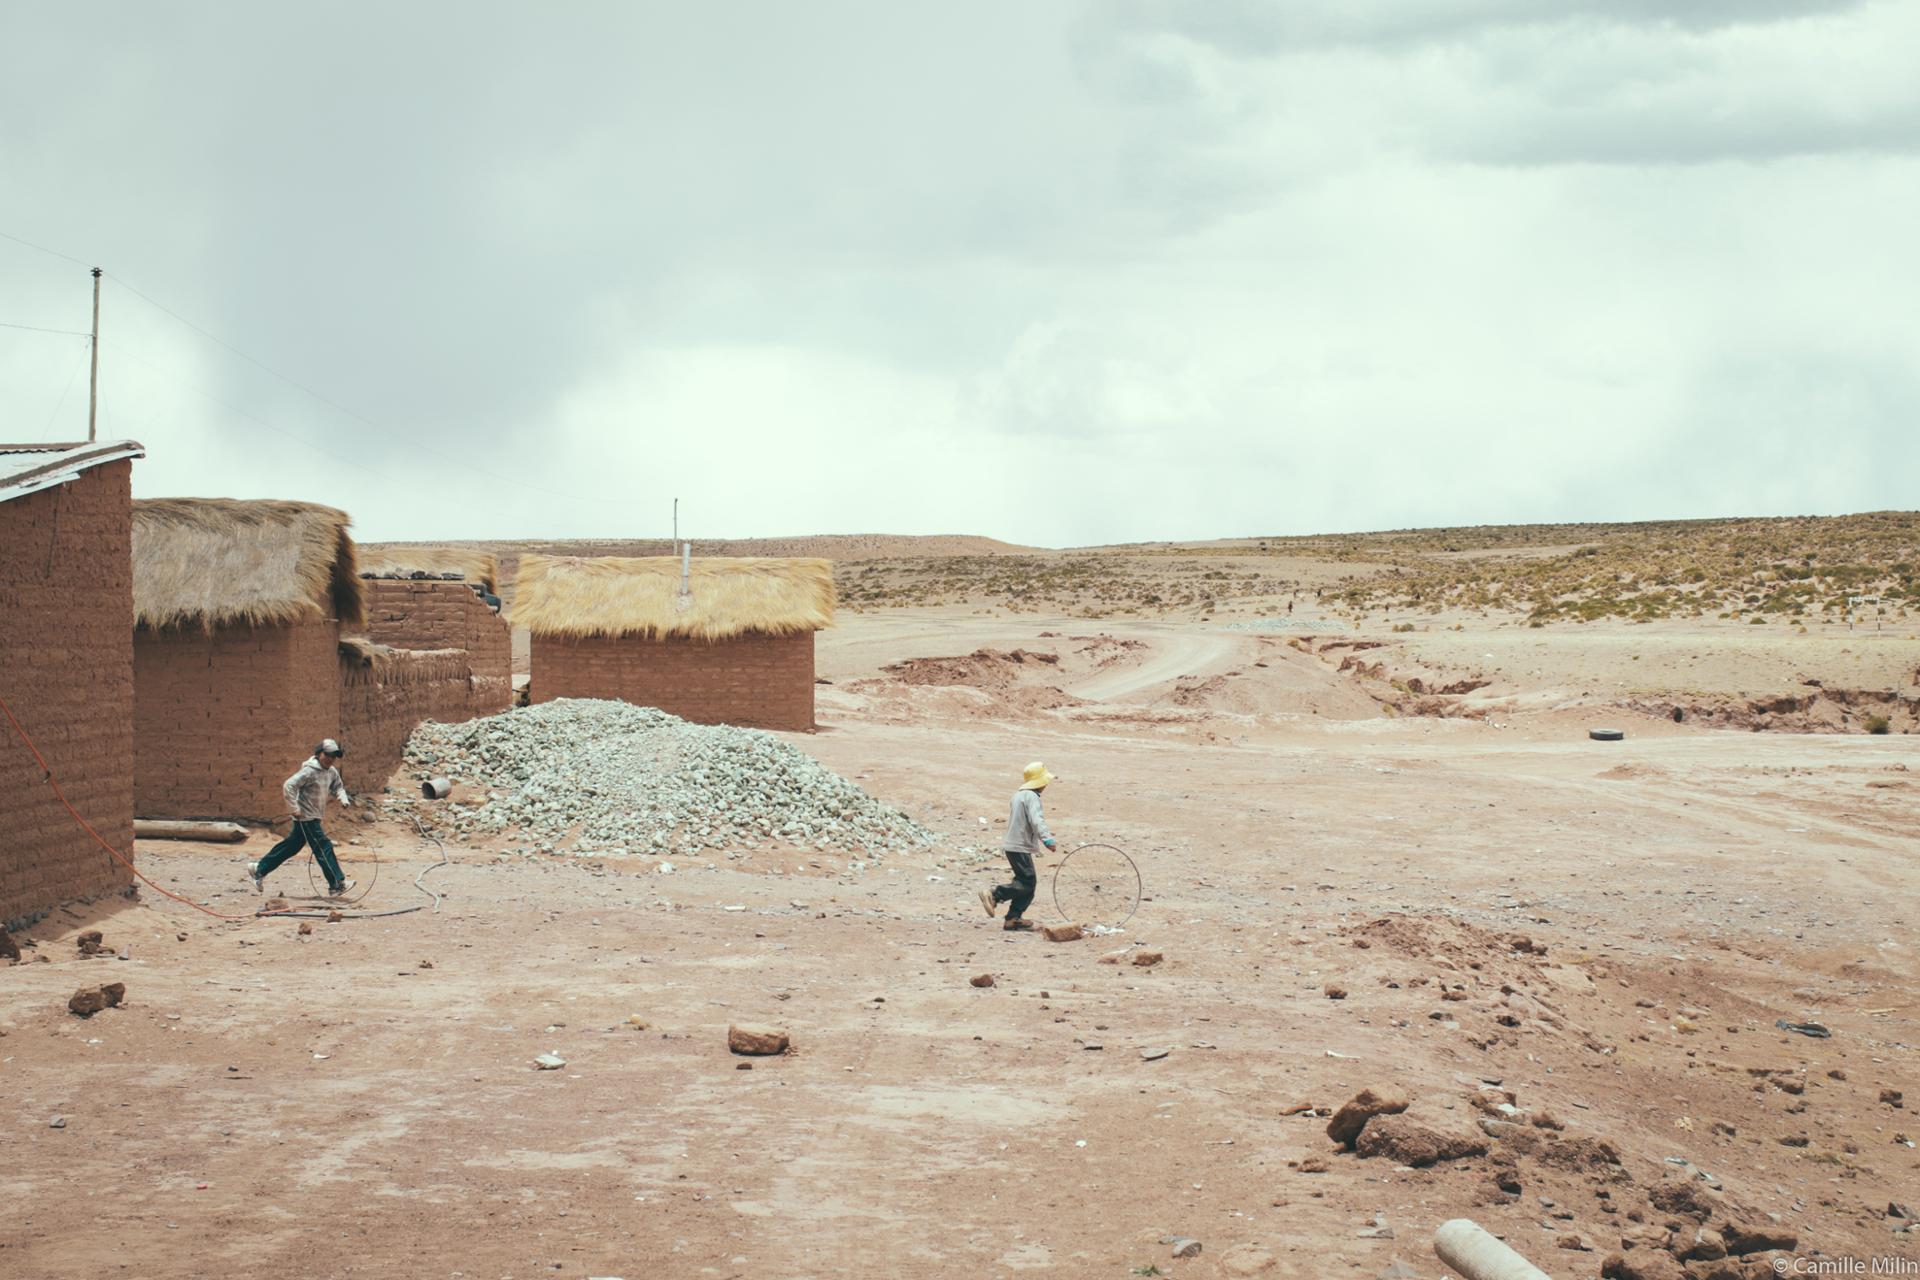 Children playing in the Desert